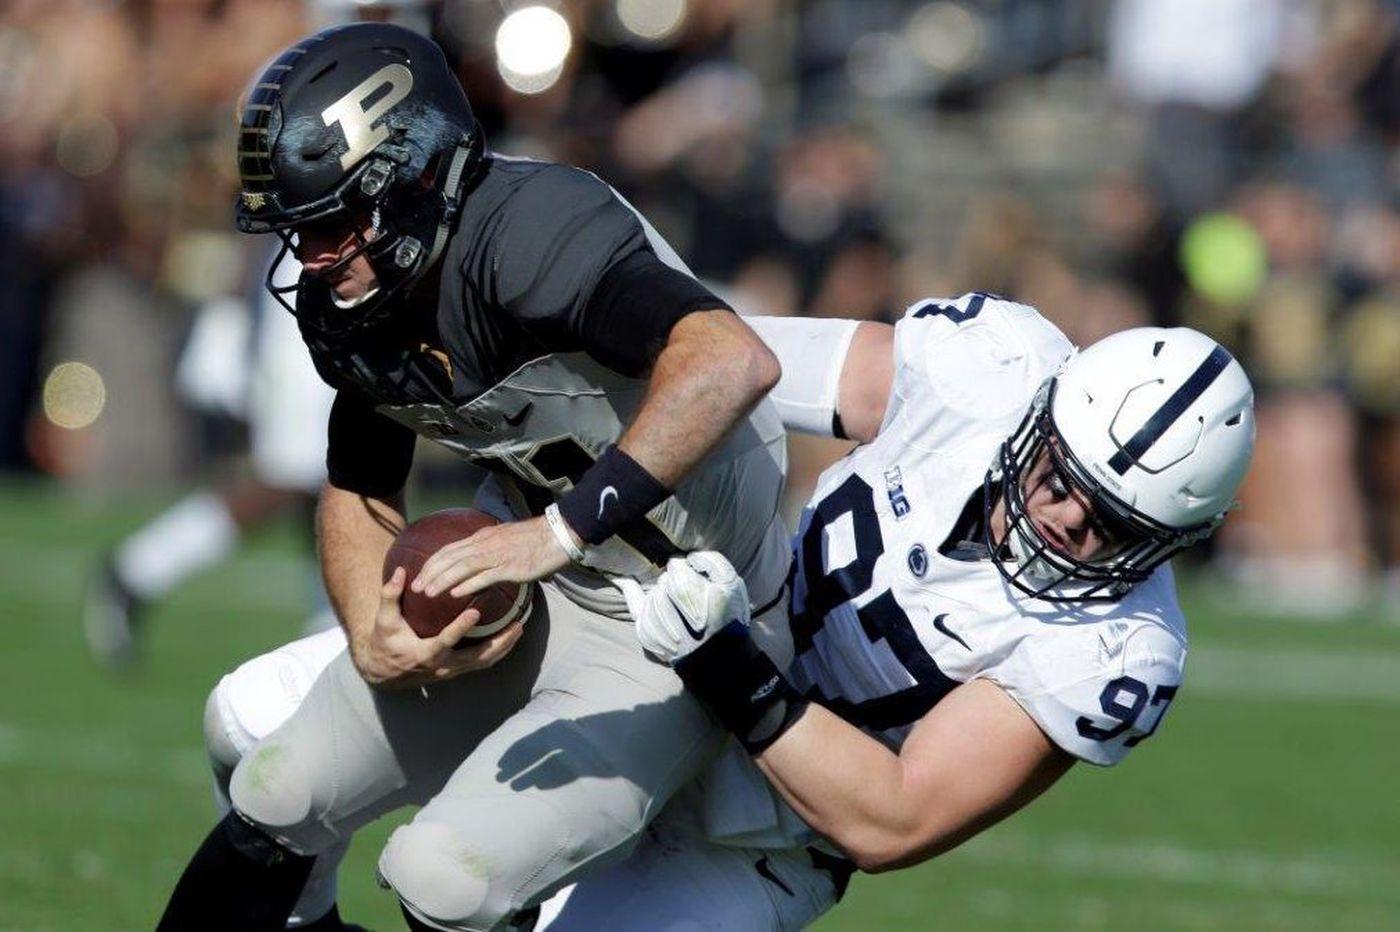 Penn State's Ryan Buchholz ends football career over back pain